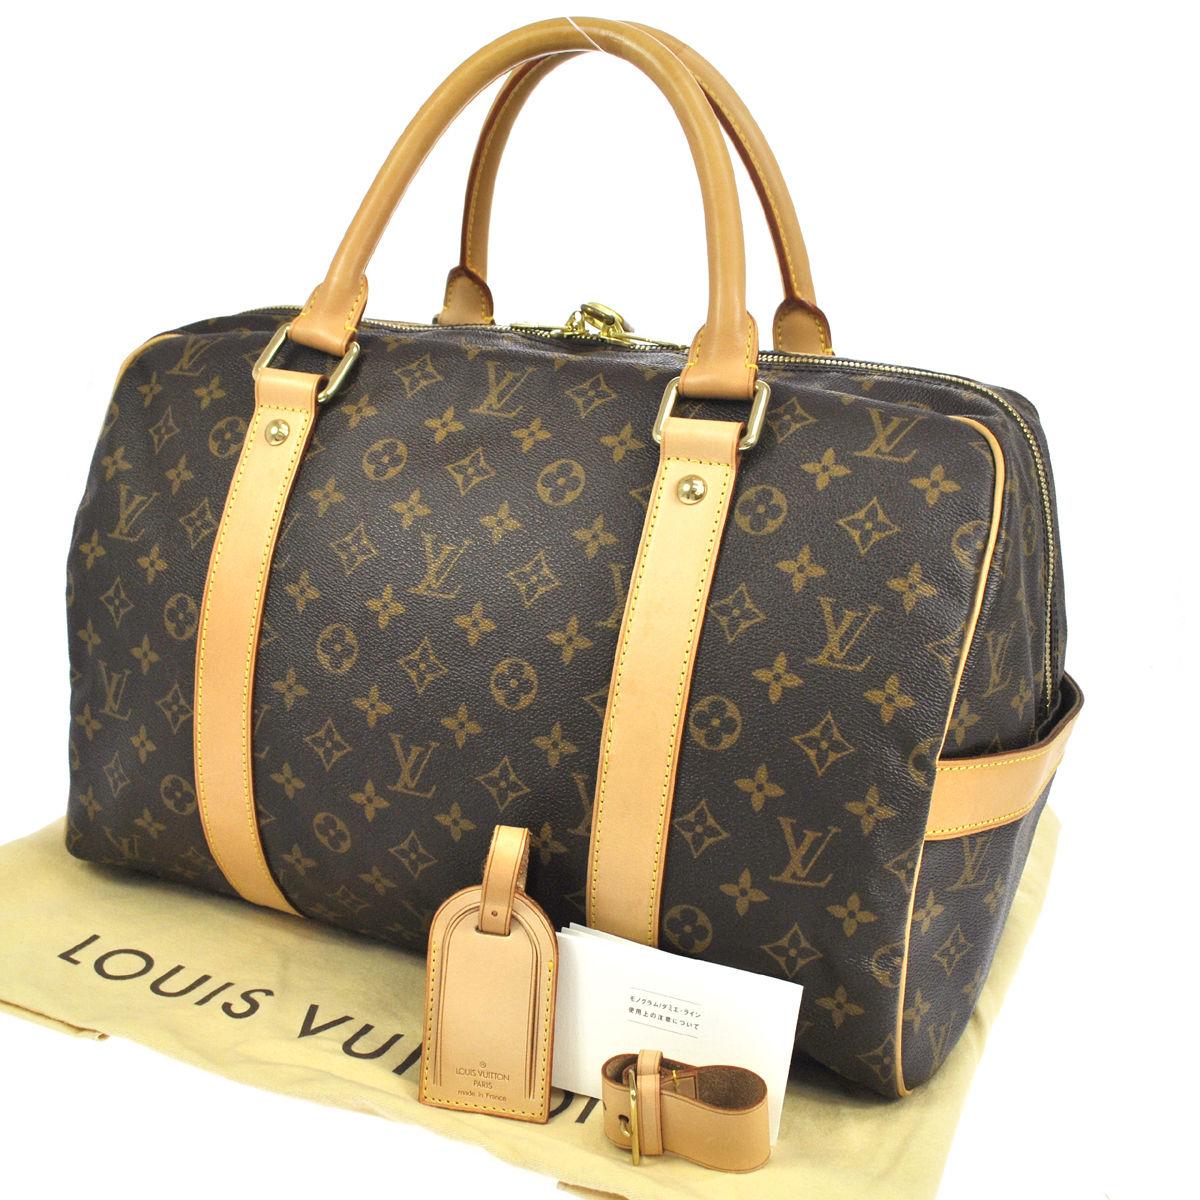 4e2b5029bbeda LOUIS VUITTON Monogram Canvas Carryall Weekend Travel Bag - My ...